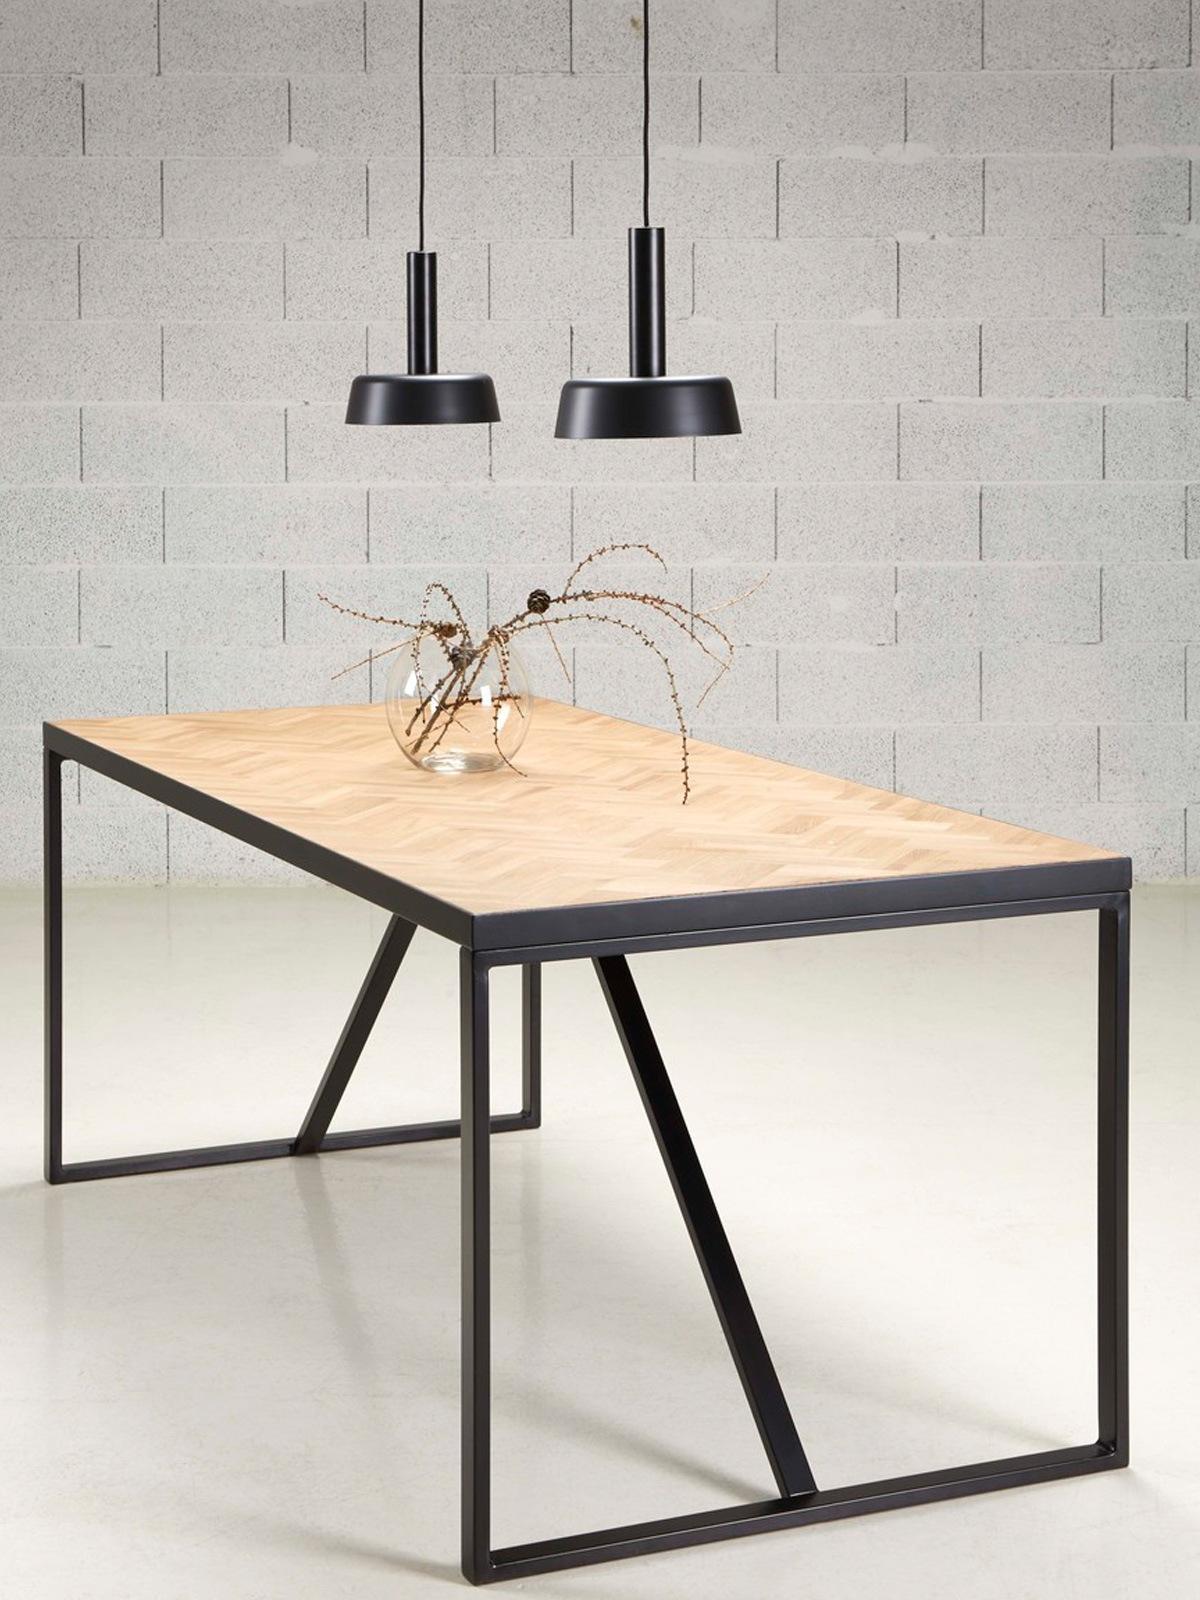 Innolux Cafe Lampe Schwarz DesignOrt Onlineshop Lampen Berlin